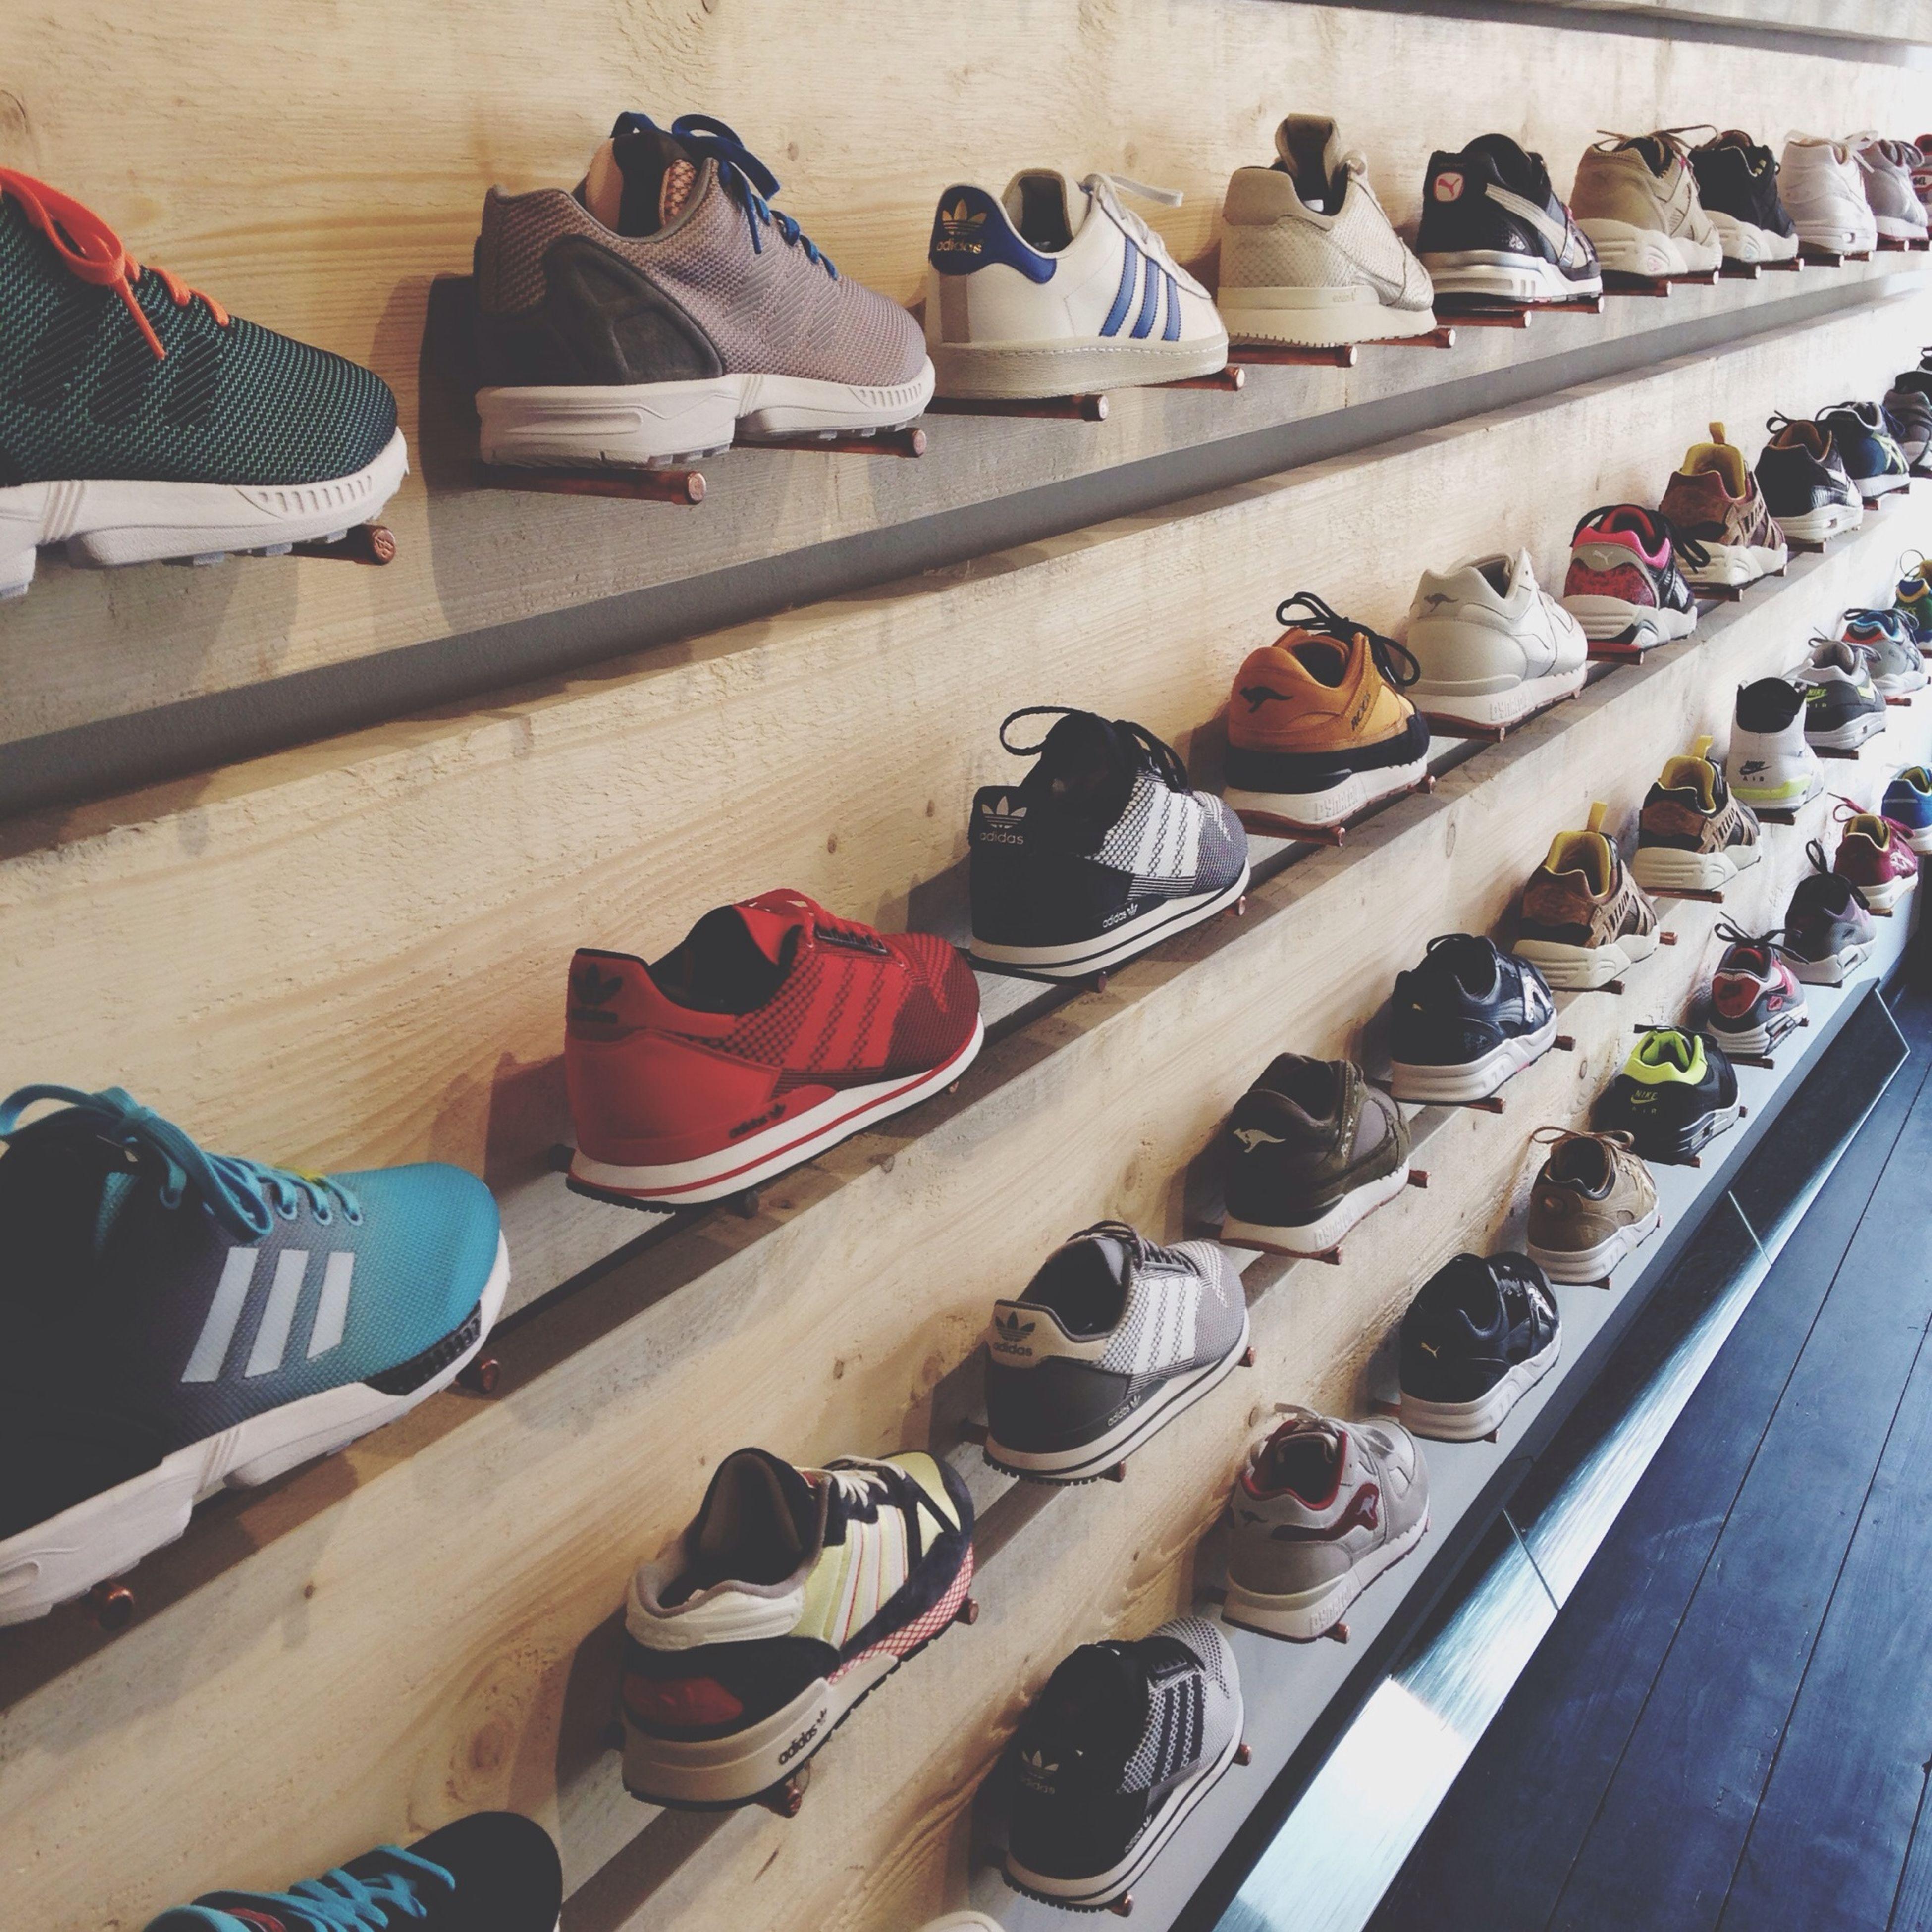 Snkrhds Snkrfrkr Matestore Sneaker